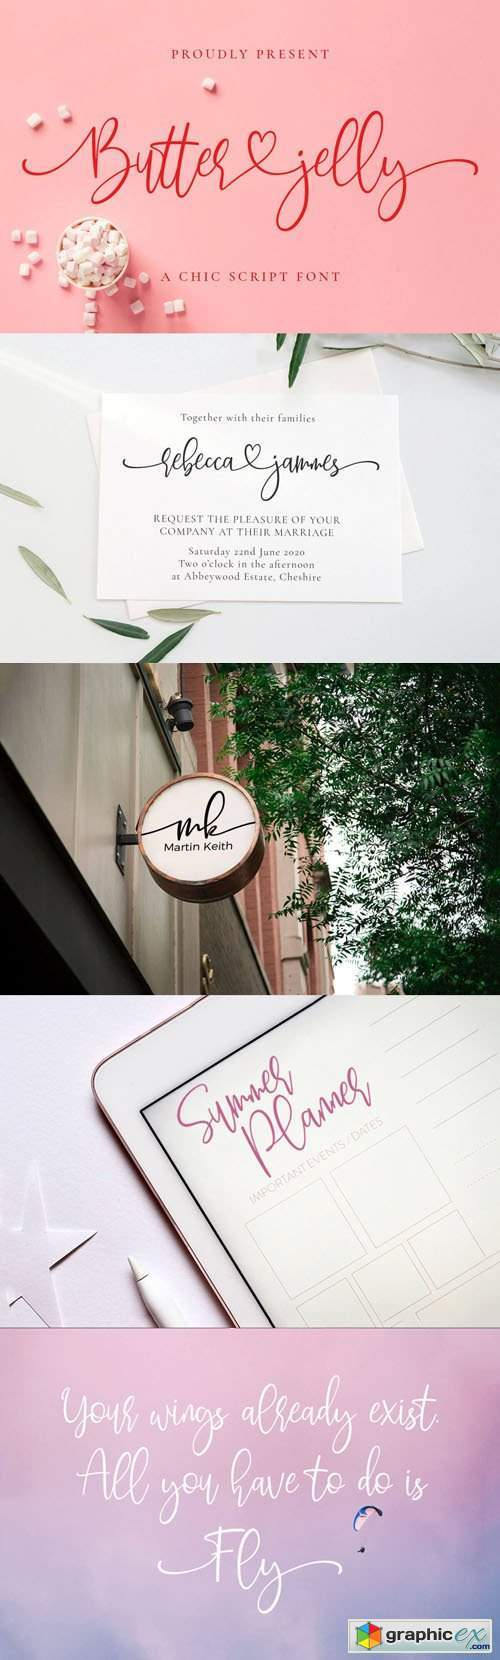 Butter Jelly - A Chic Script Font